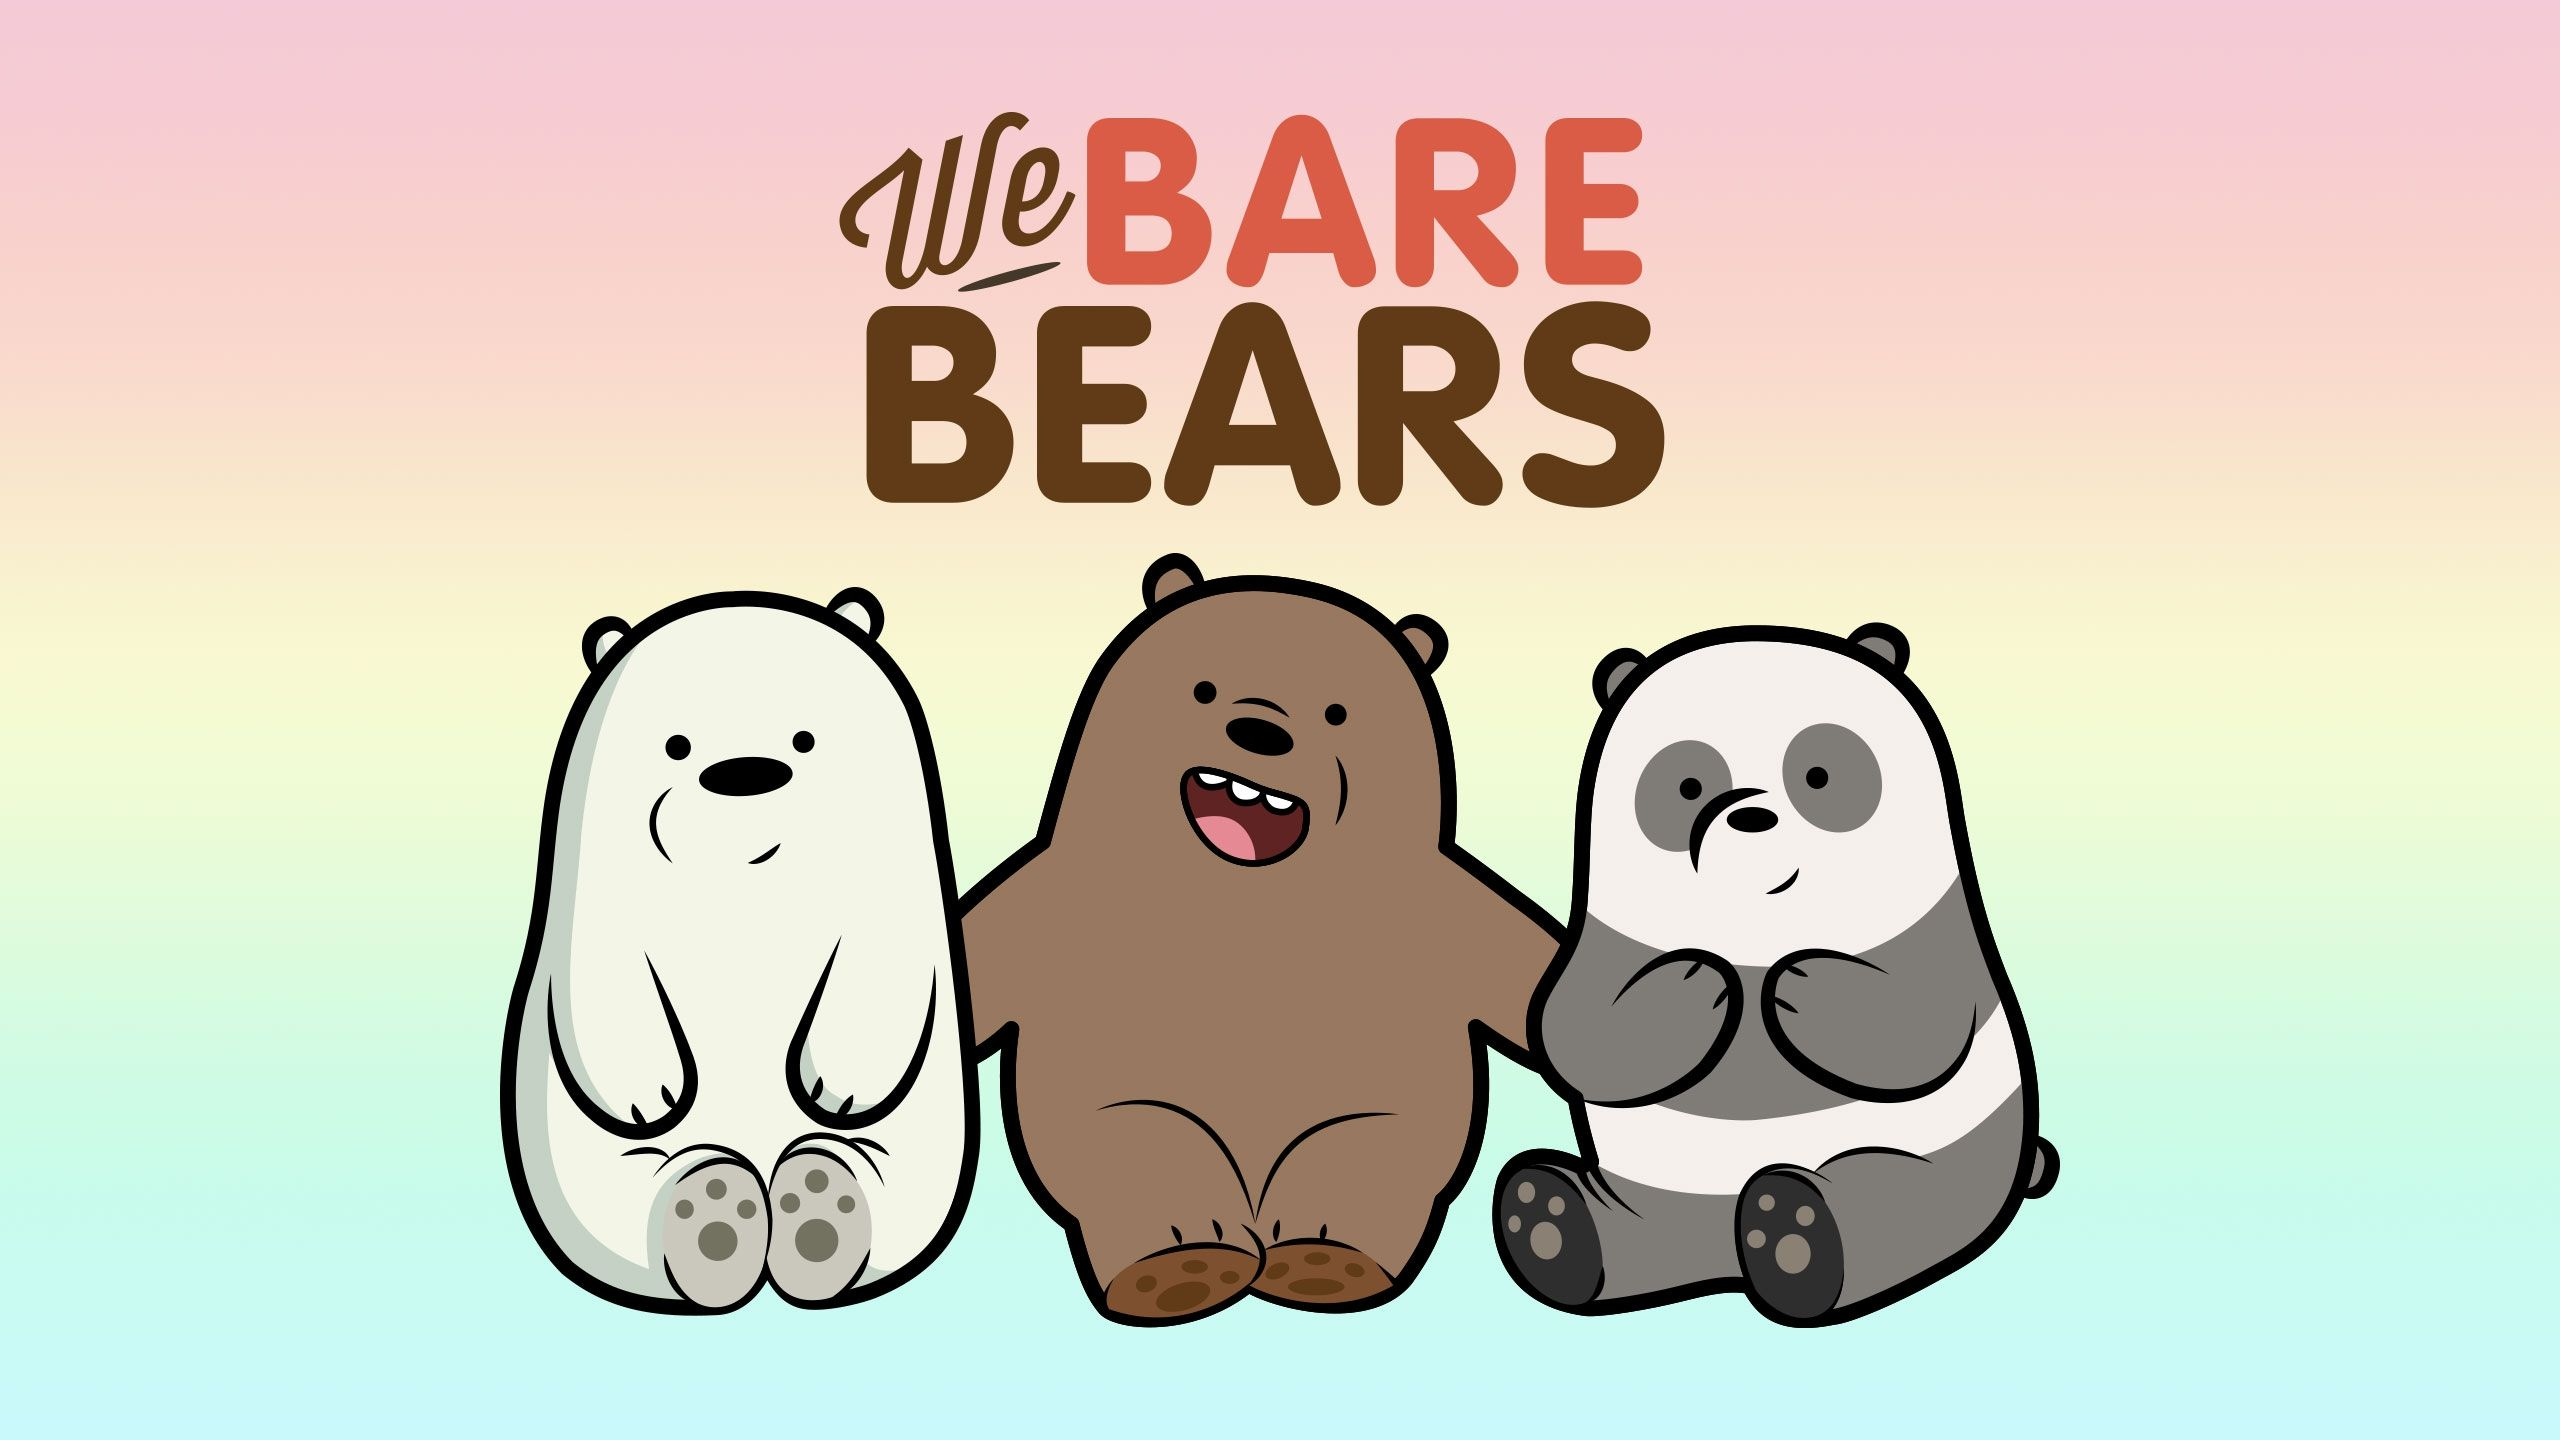 We Bare Bears Wallpaper Computer All Cartoon Wallpapers Di 2020 Kartun